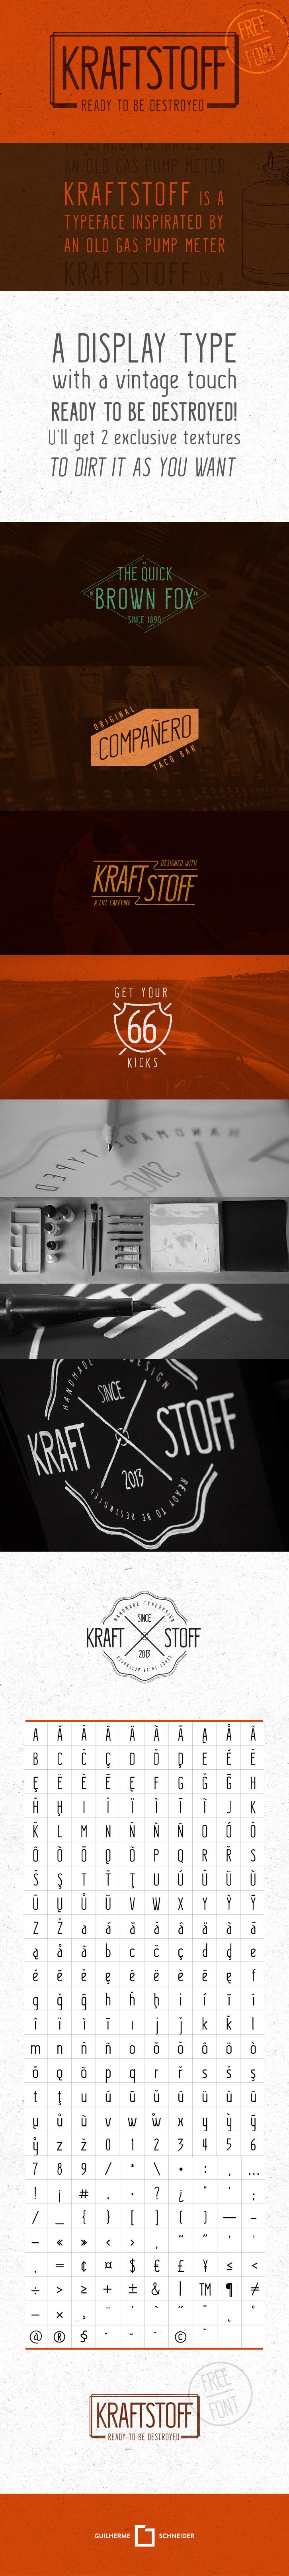 Krafstoff Typeface - Hand Drawn Display Font